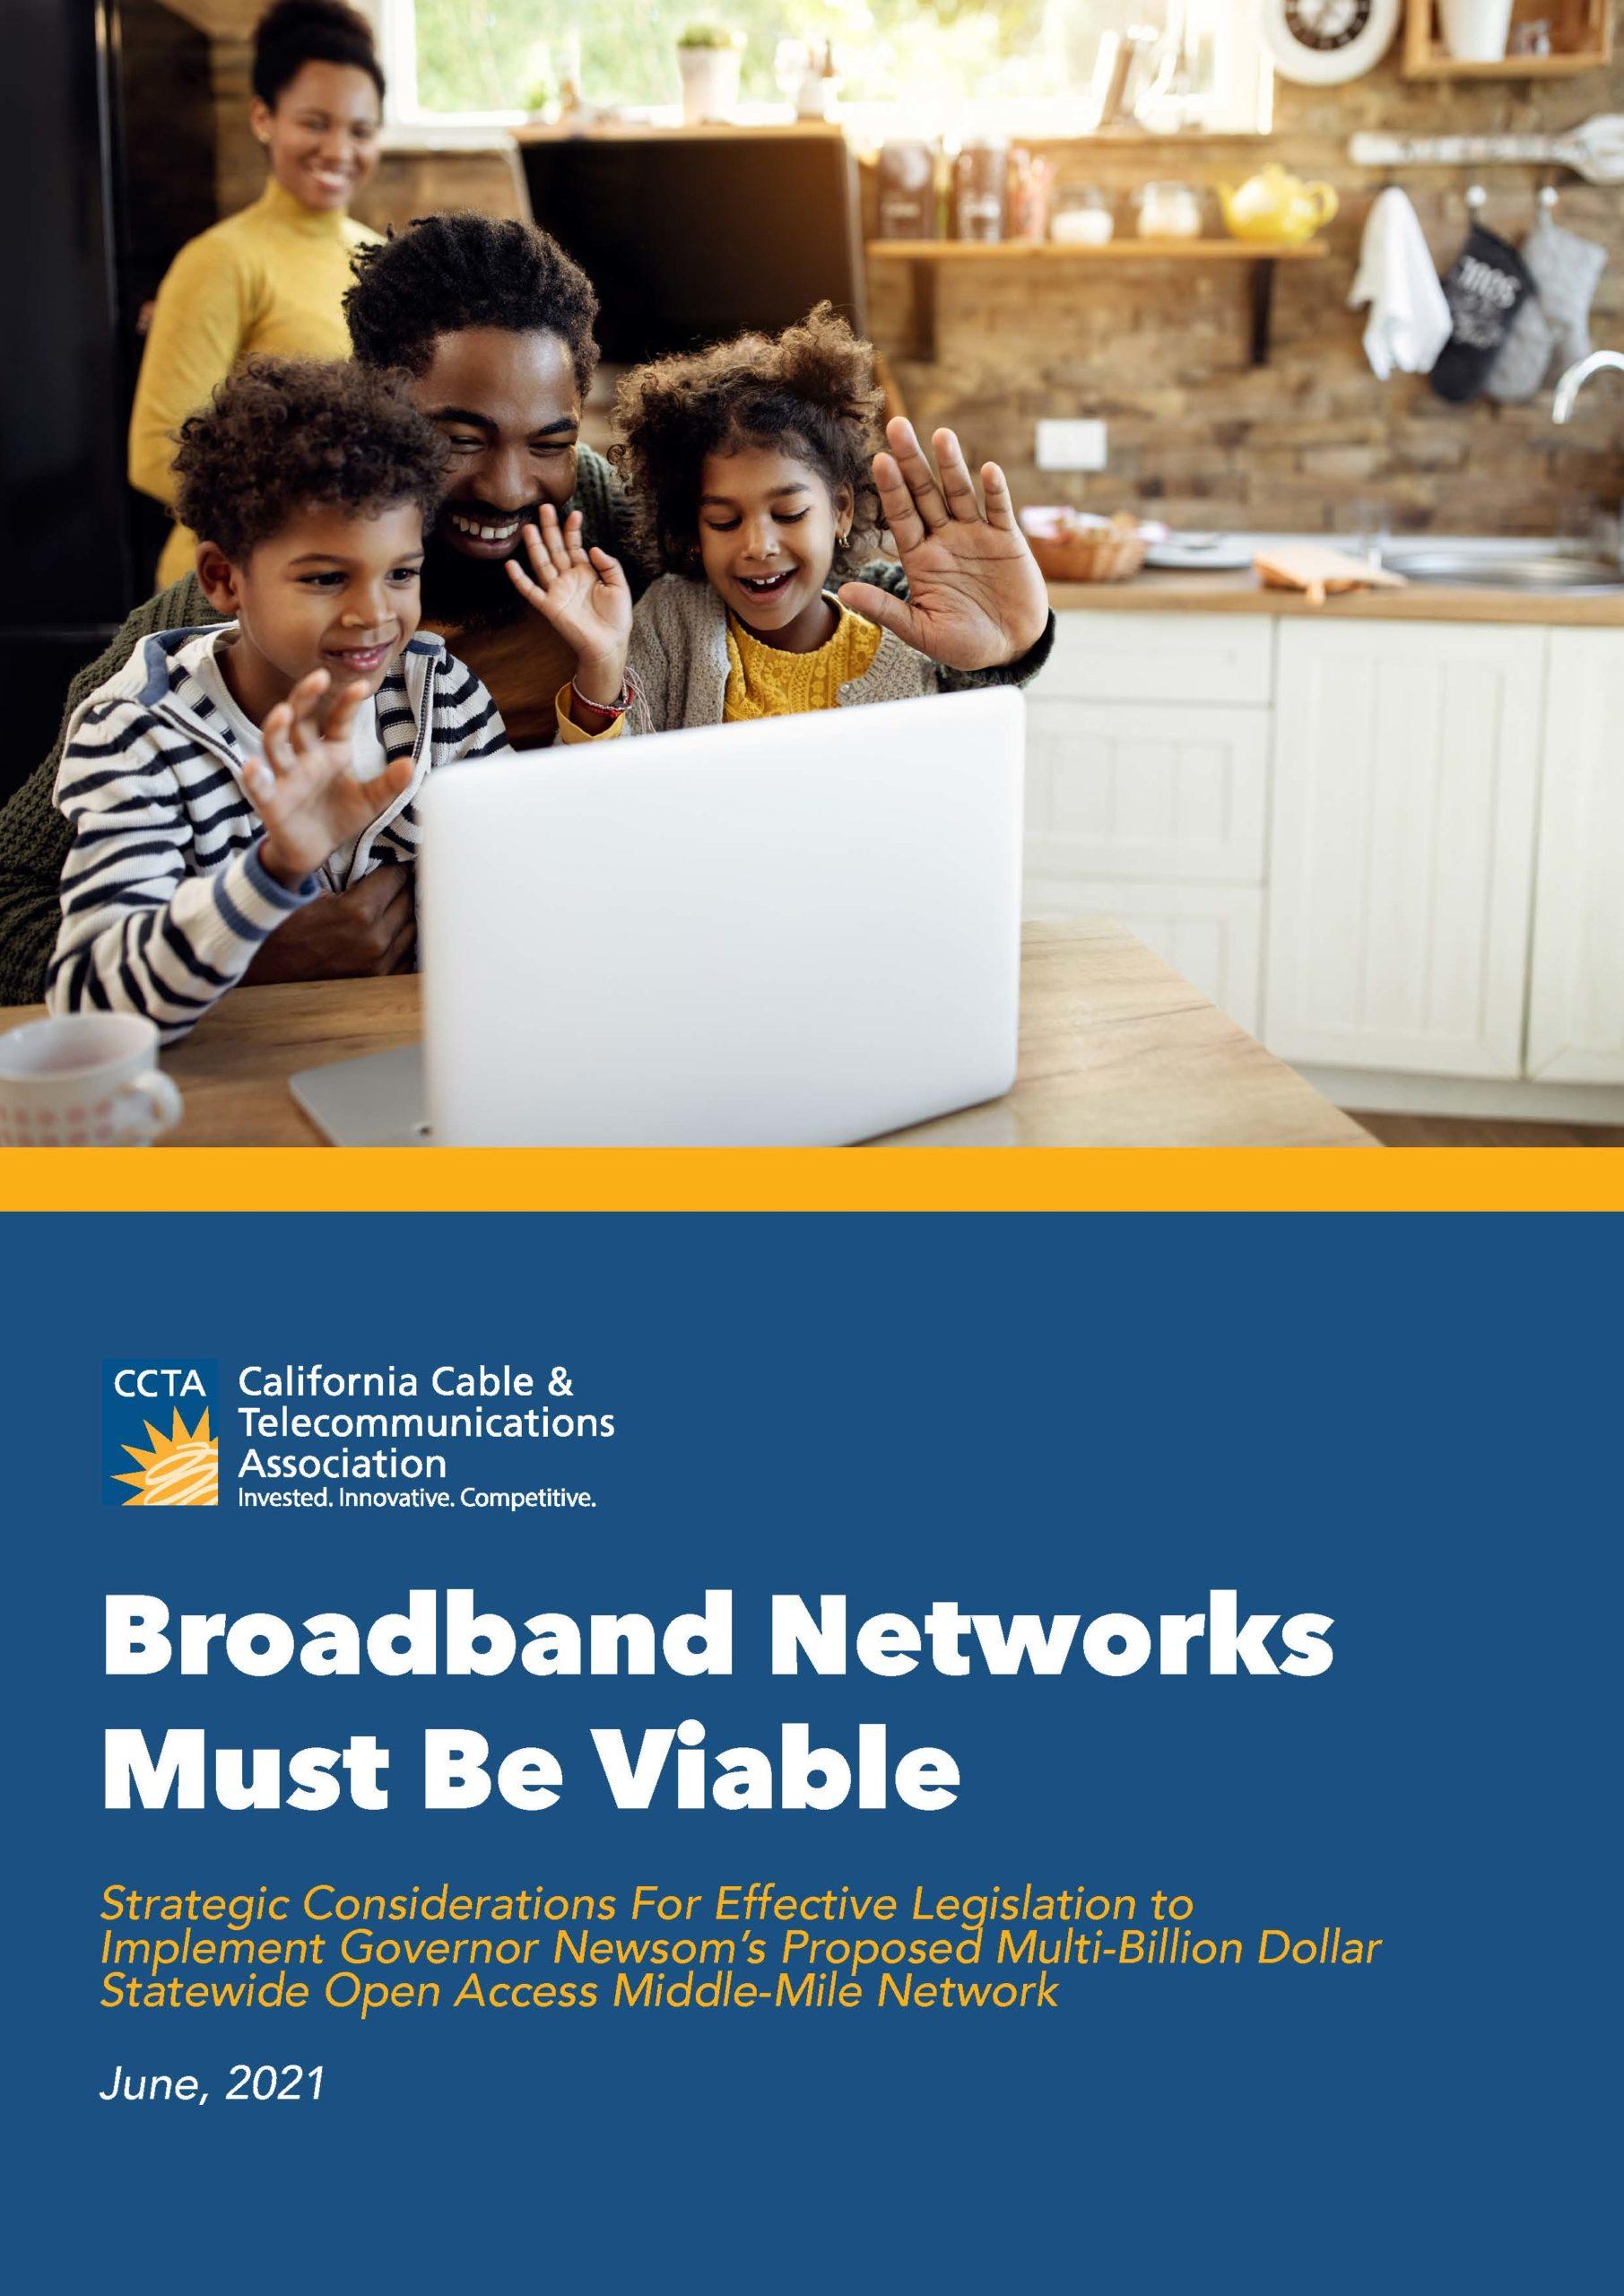 CCTA Broadband Networks Viability Report June 2021_Page_1